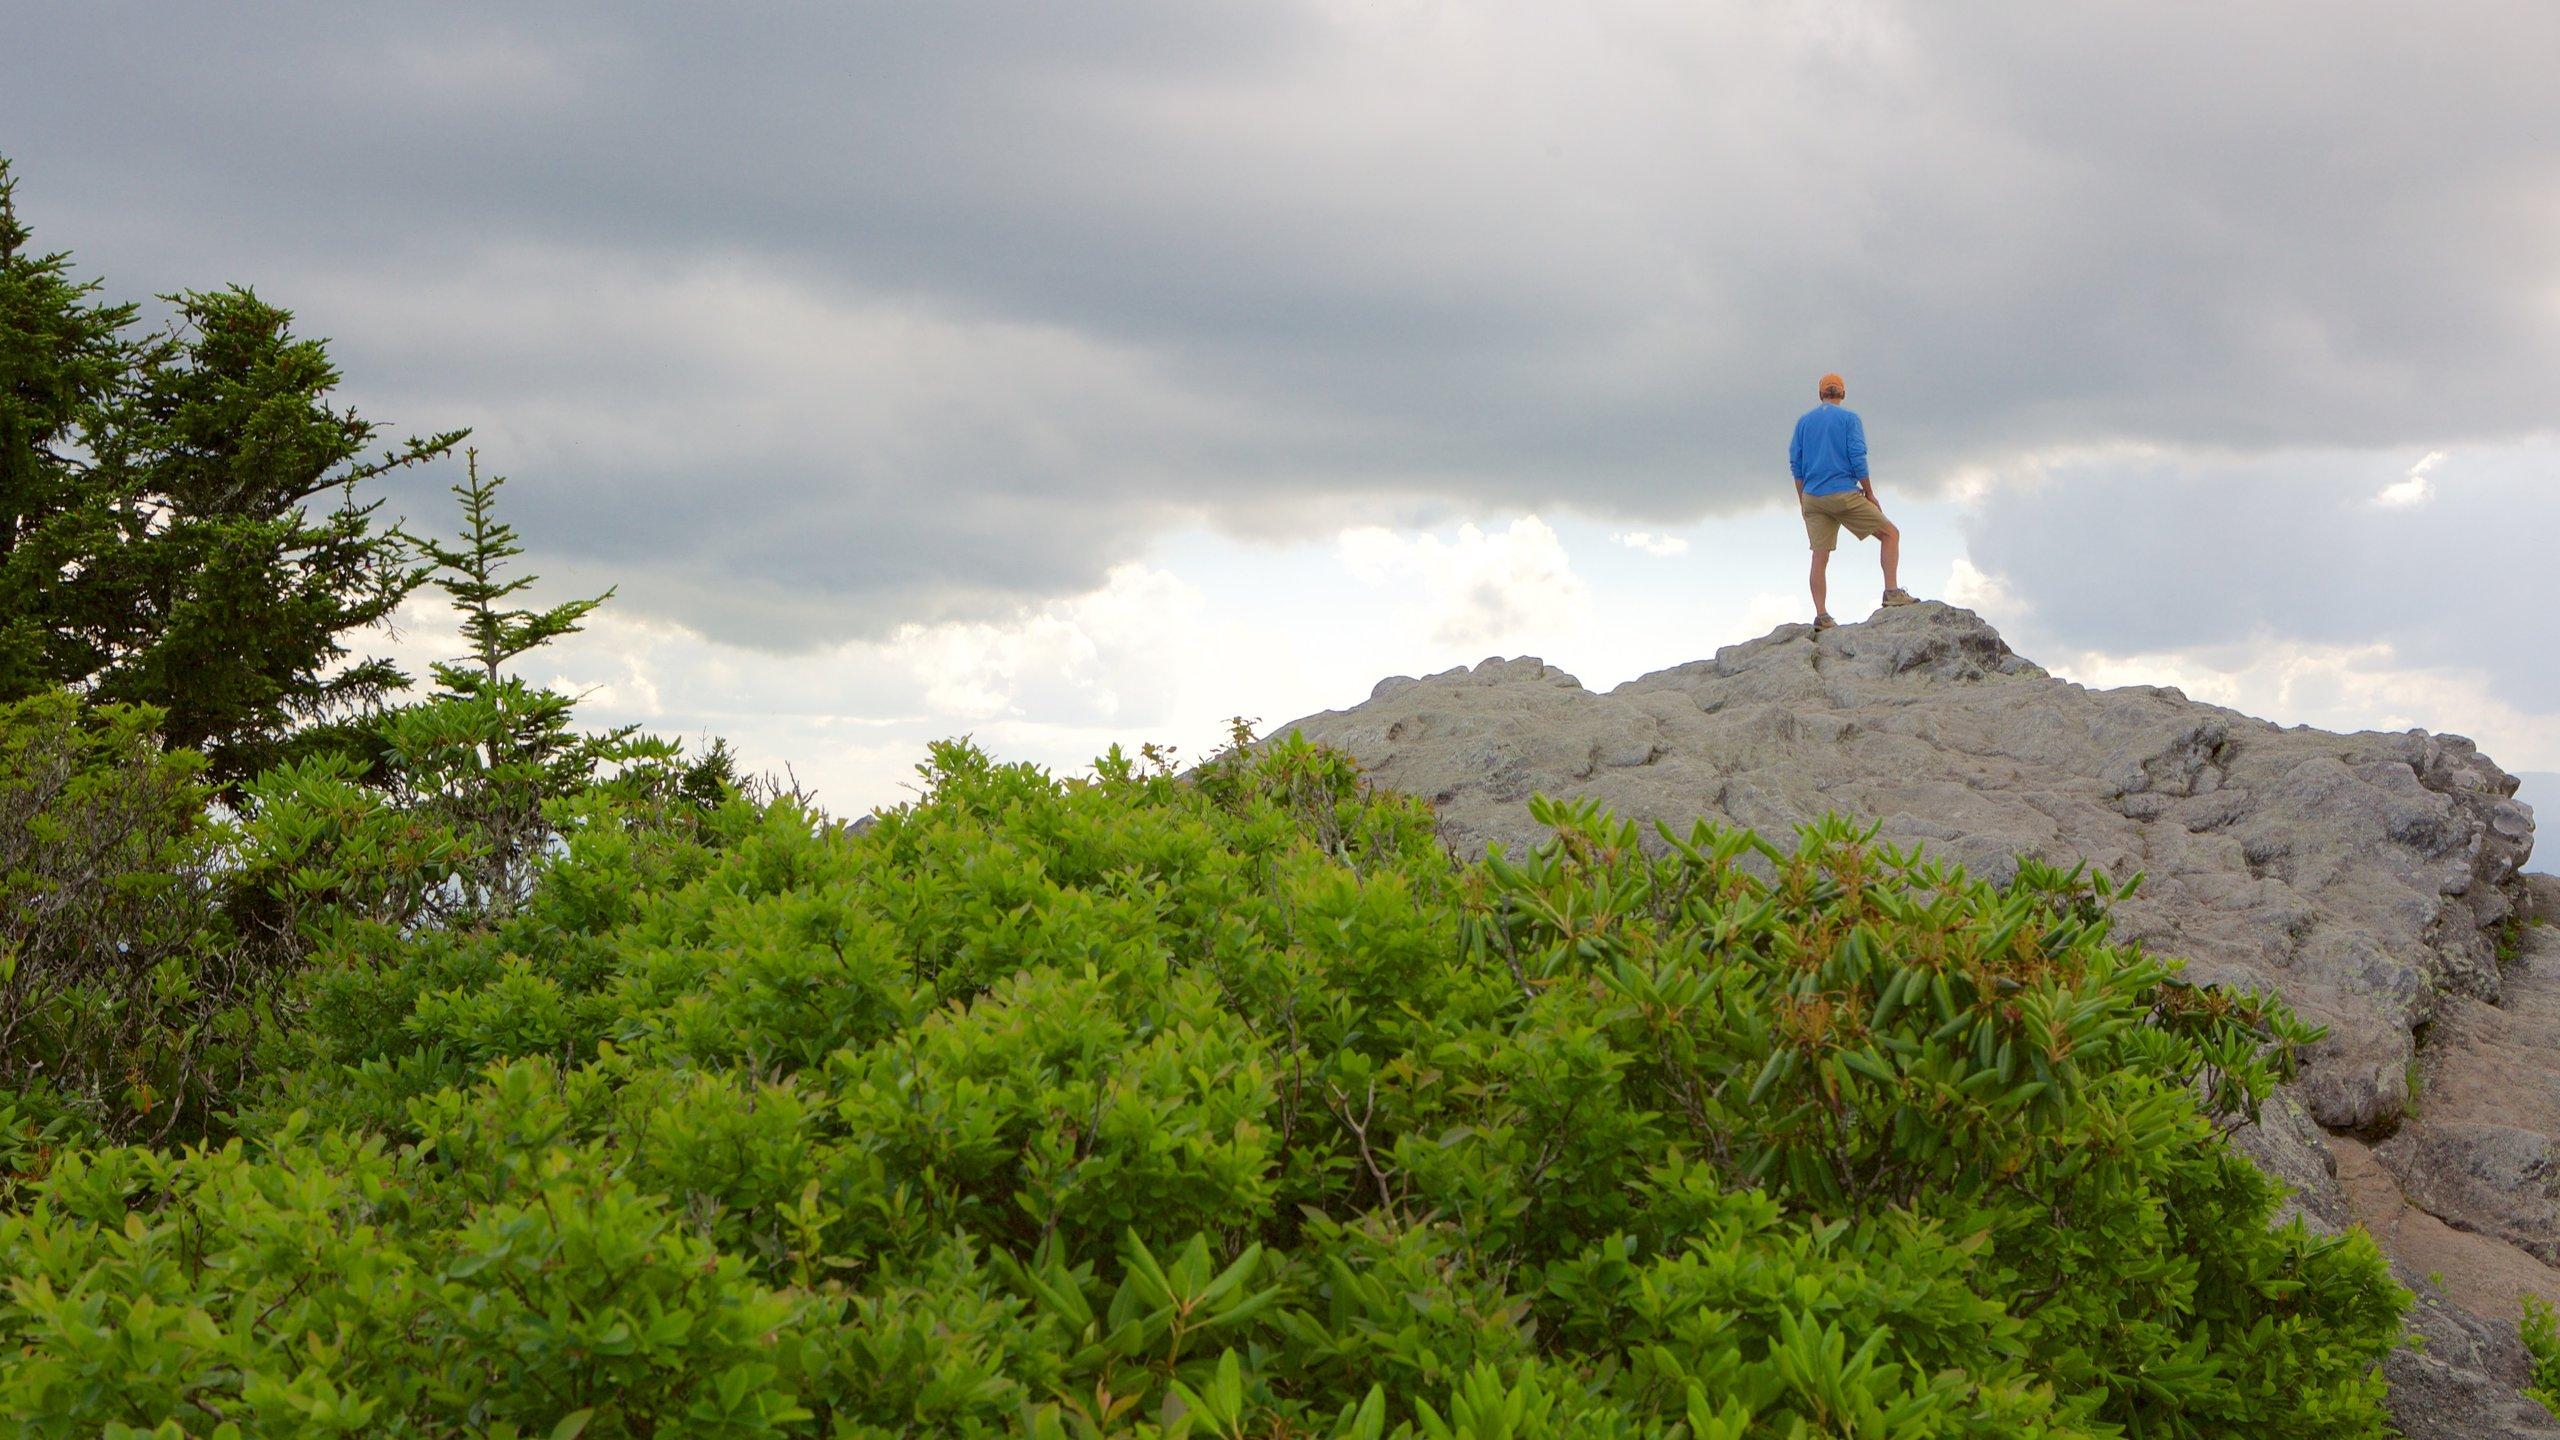 Grandfather Mountain, Linville, North Carolina, United States of America